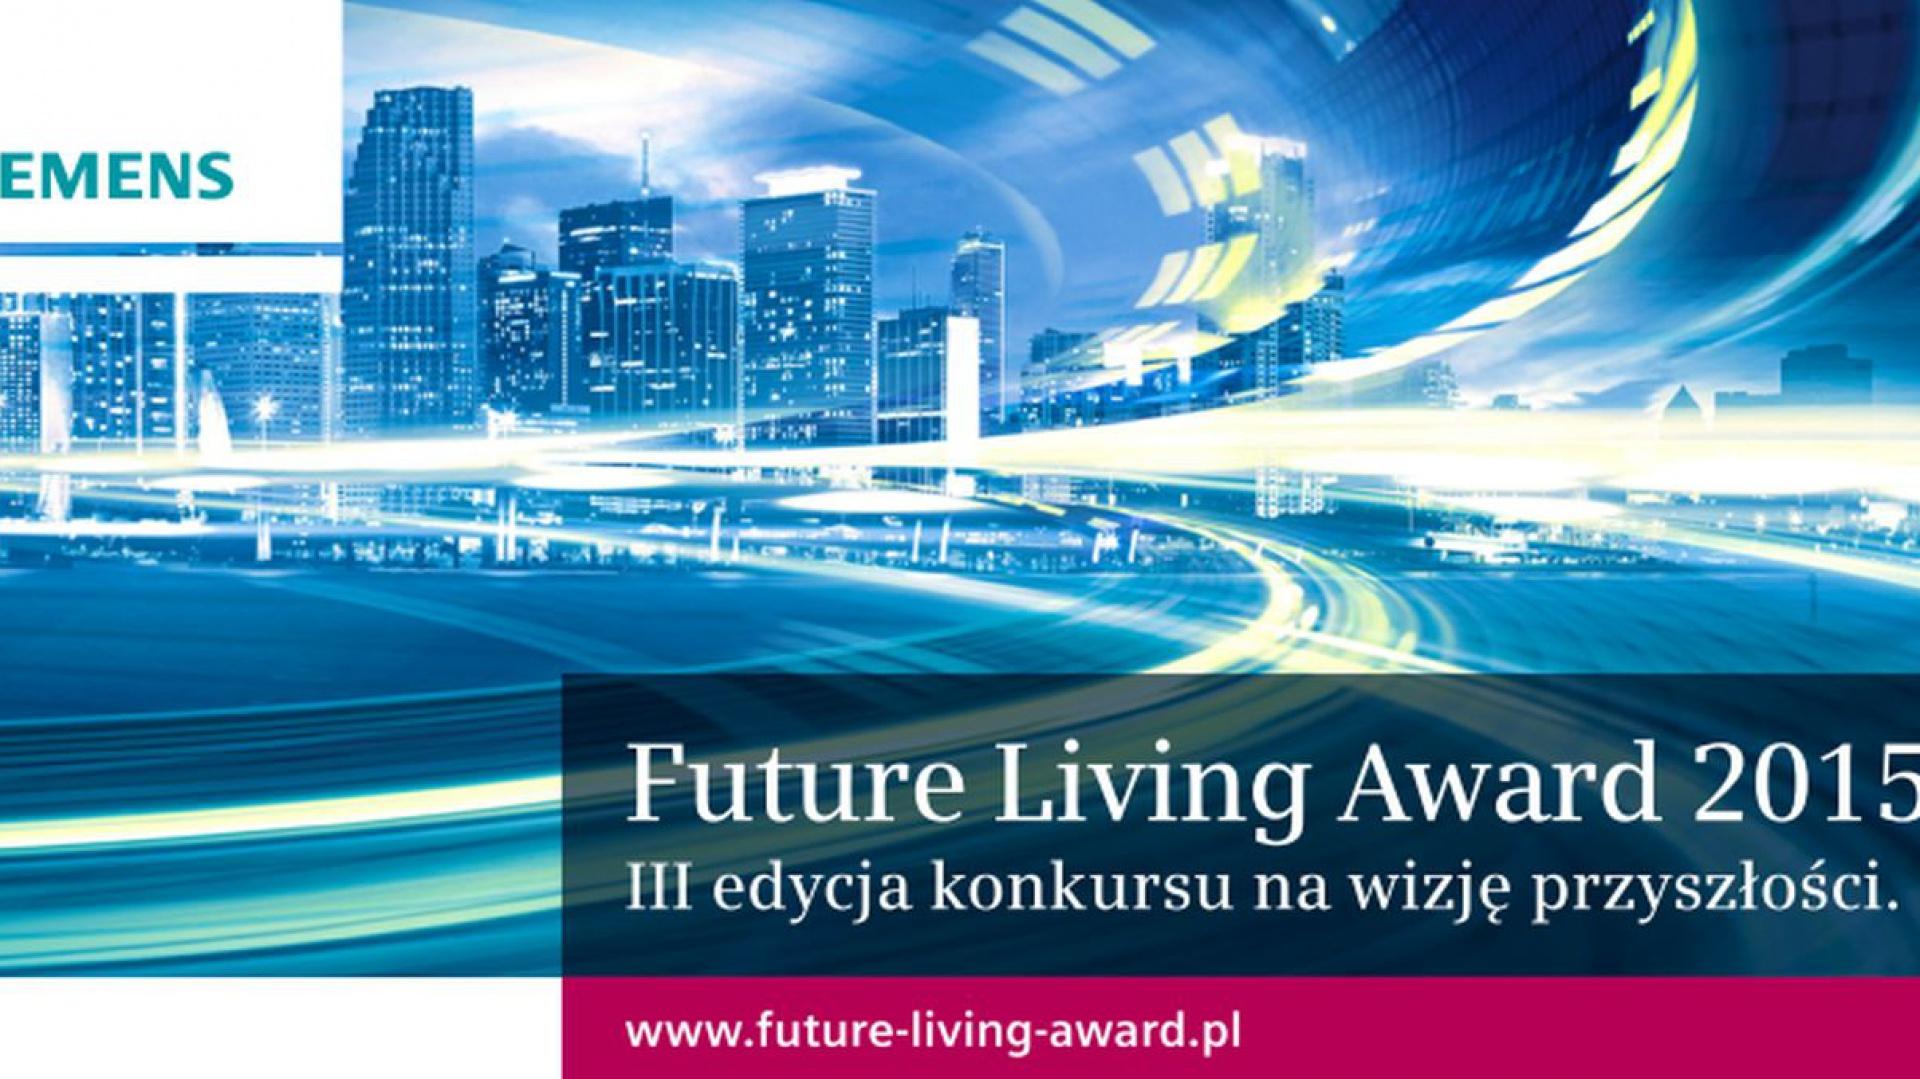 Future Living Award 2015